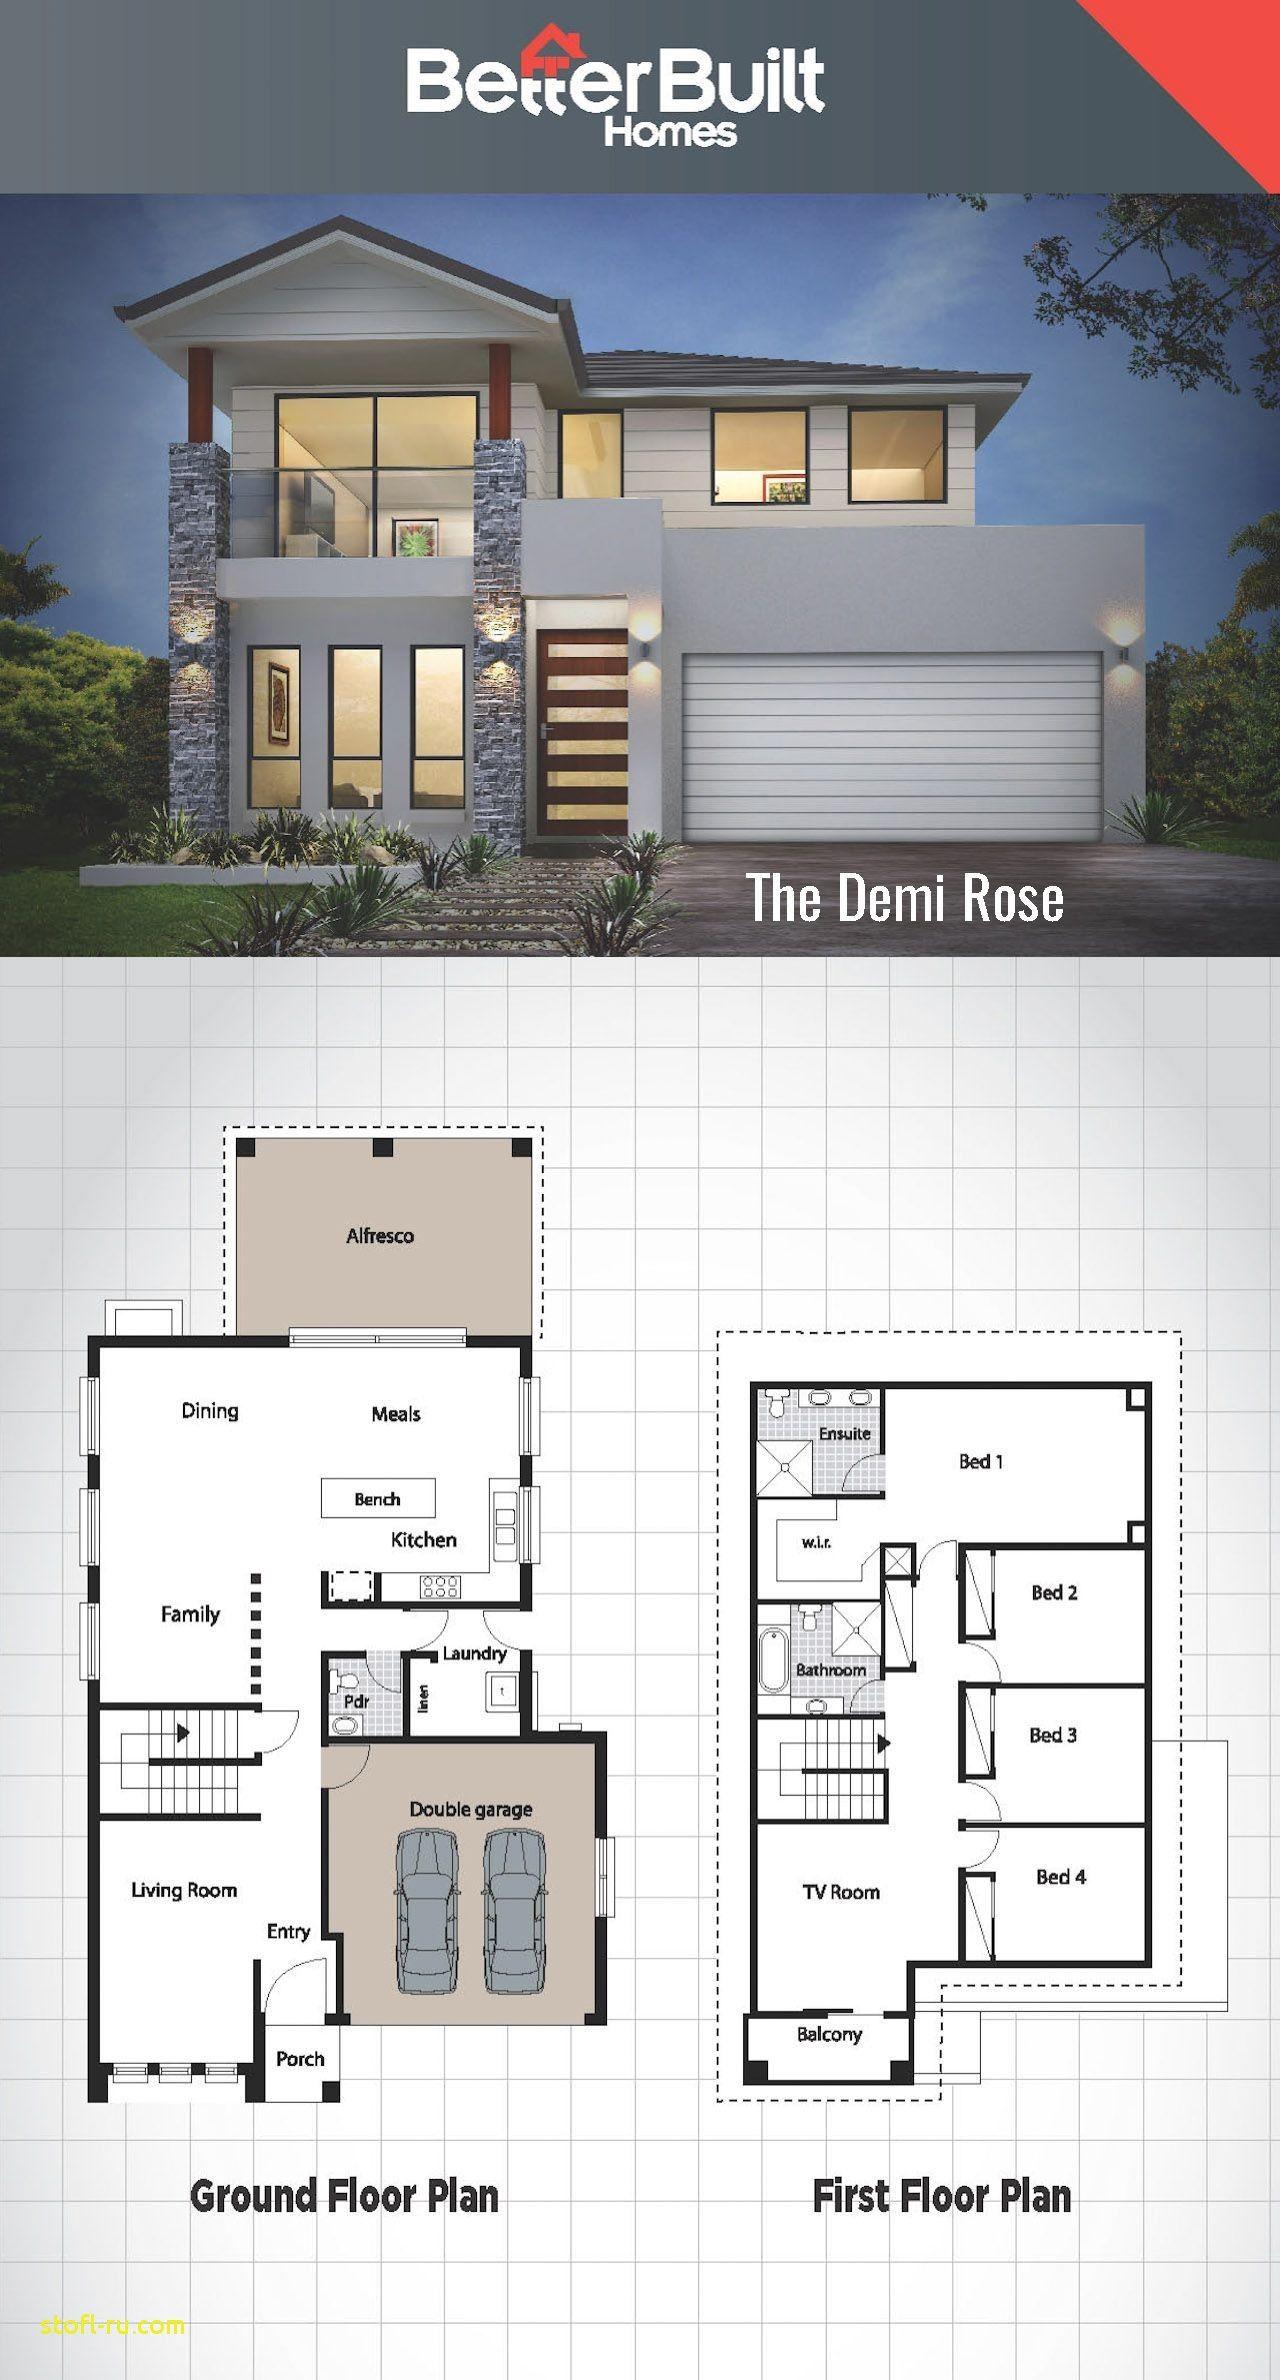 Double storey homes designs doublestorey design doublestoryhomedesigns housedesign doublestoreyhomes doublestoreyhomesfacade also rh pinterest